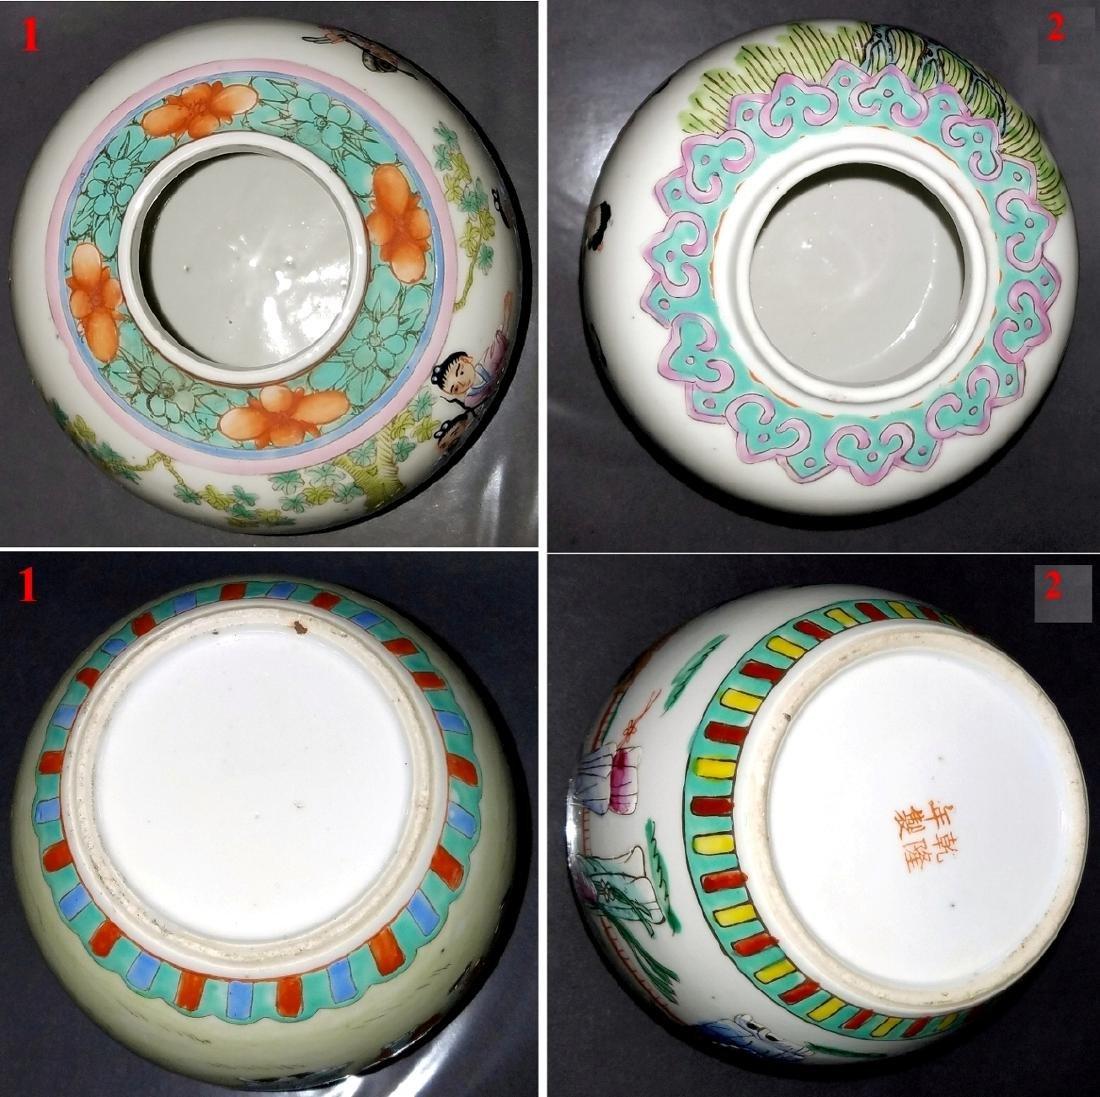 Pair of Qianlong Nian Zhi Antique Vases 1736-1795 - 5